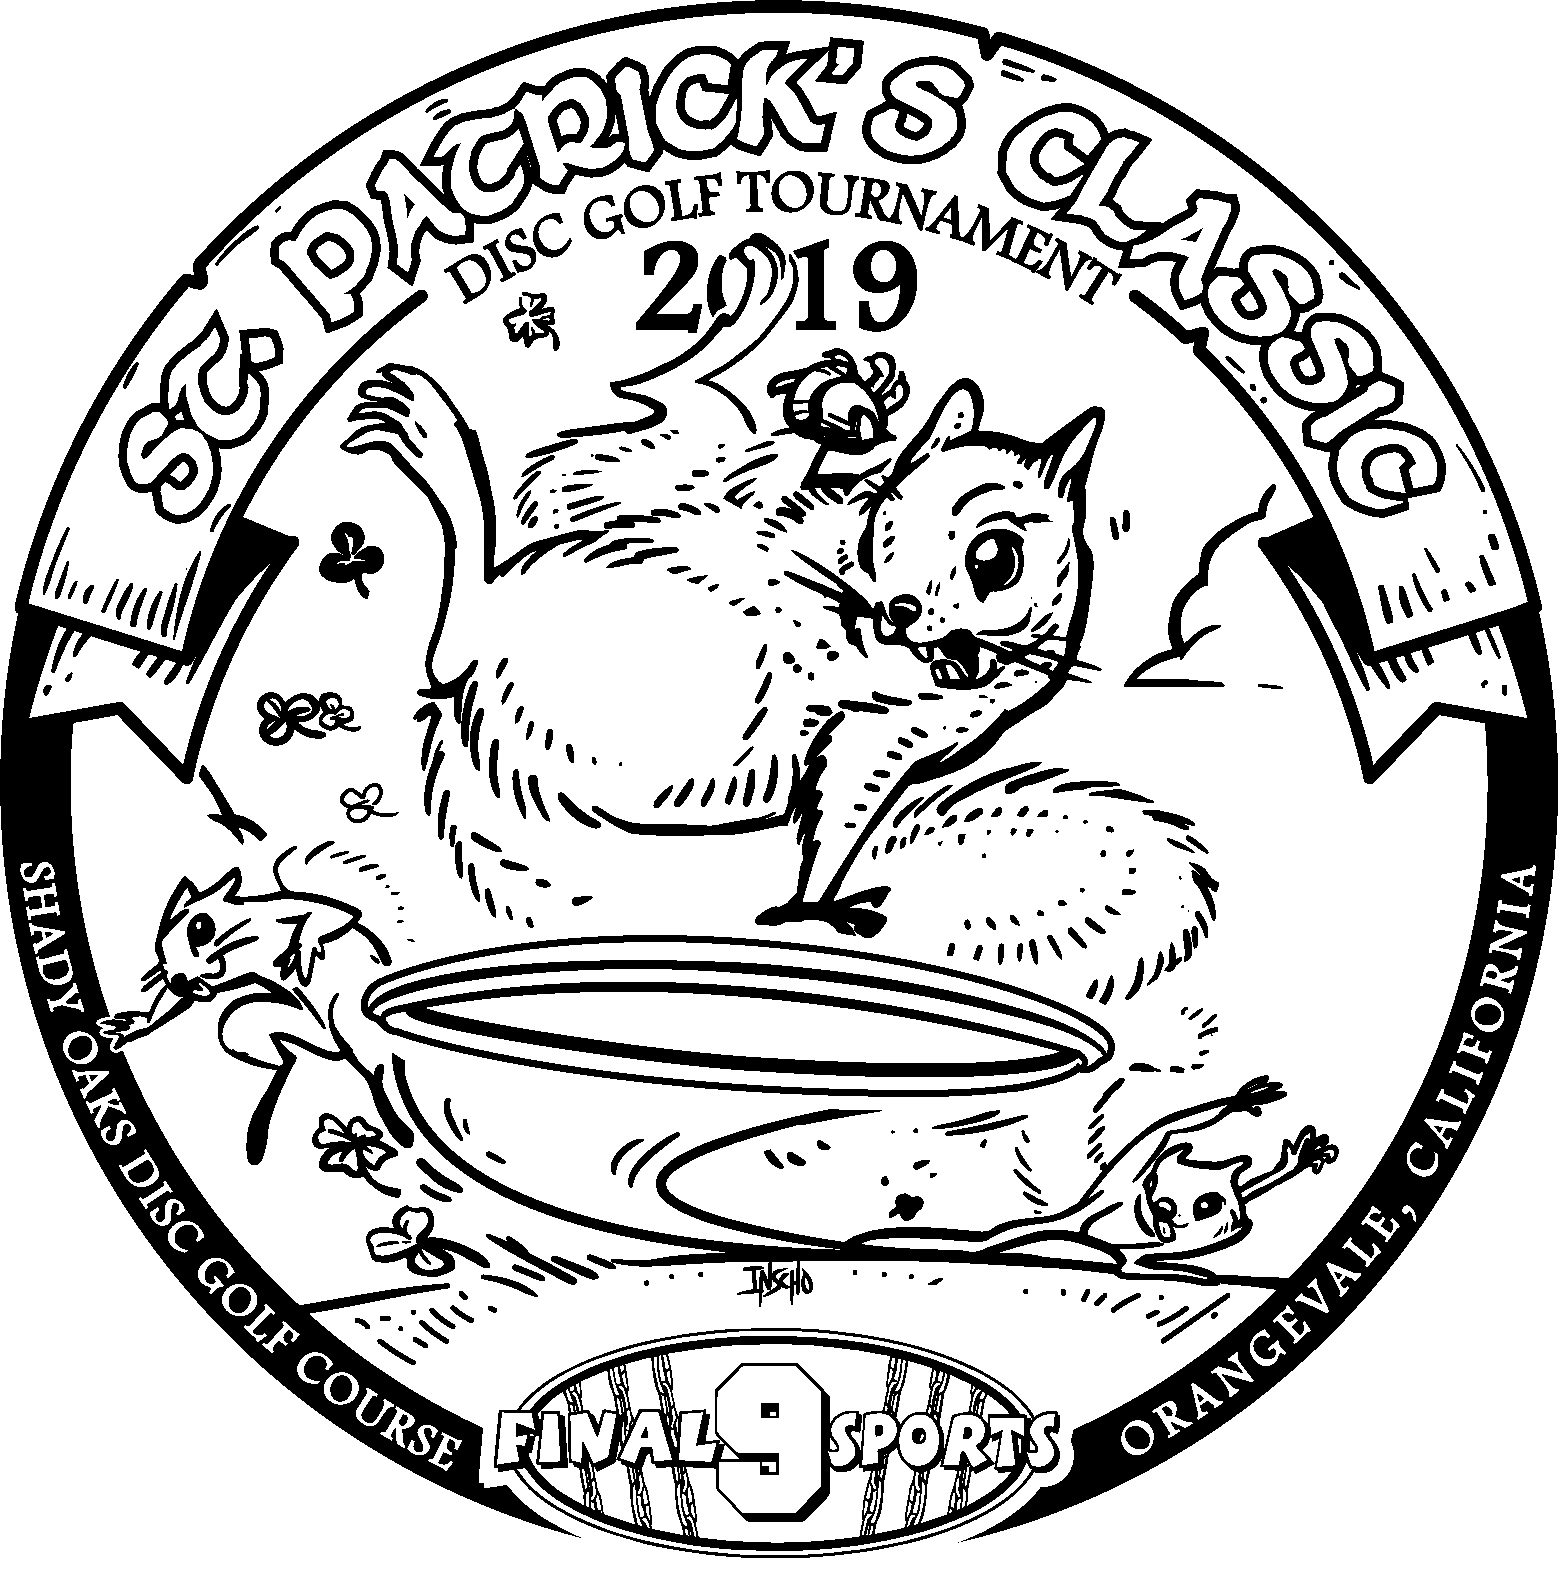 2019StPatricksClassic_FINAL02.jpg